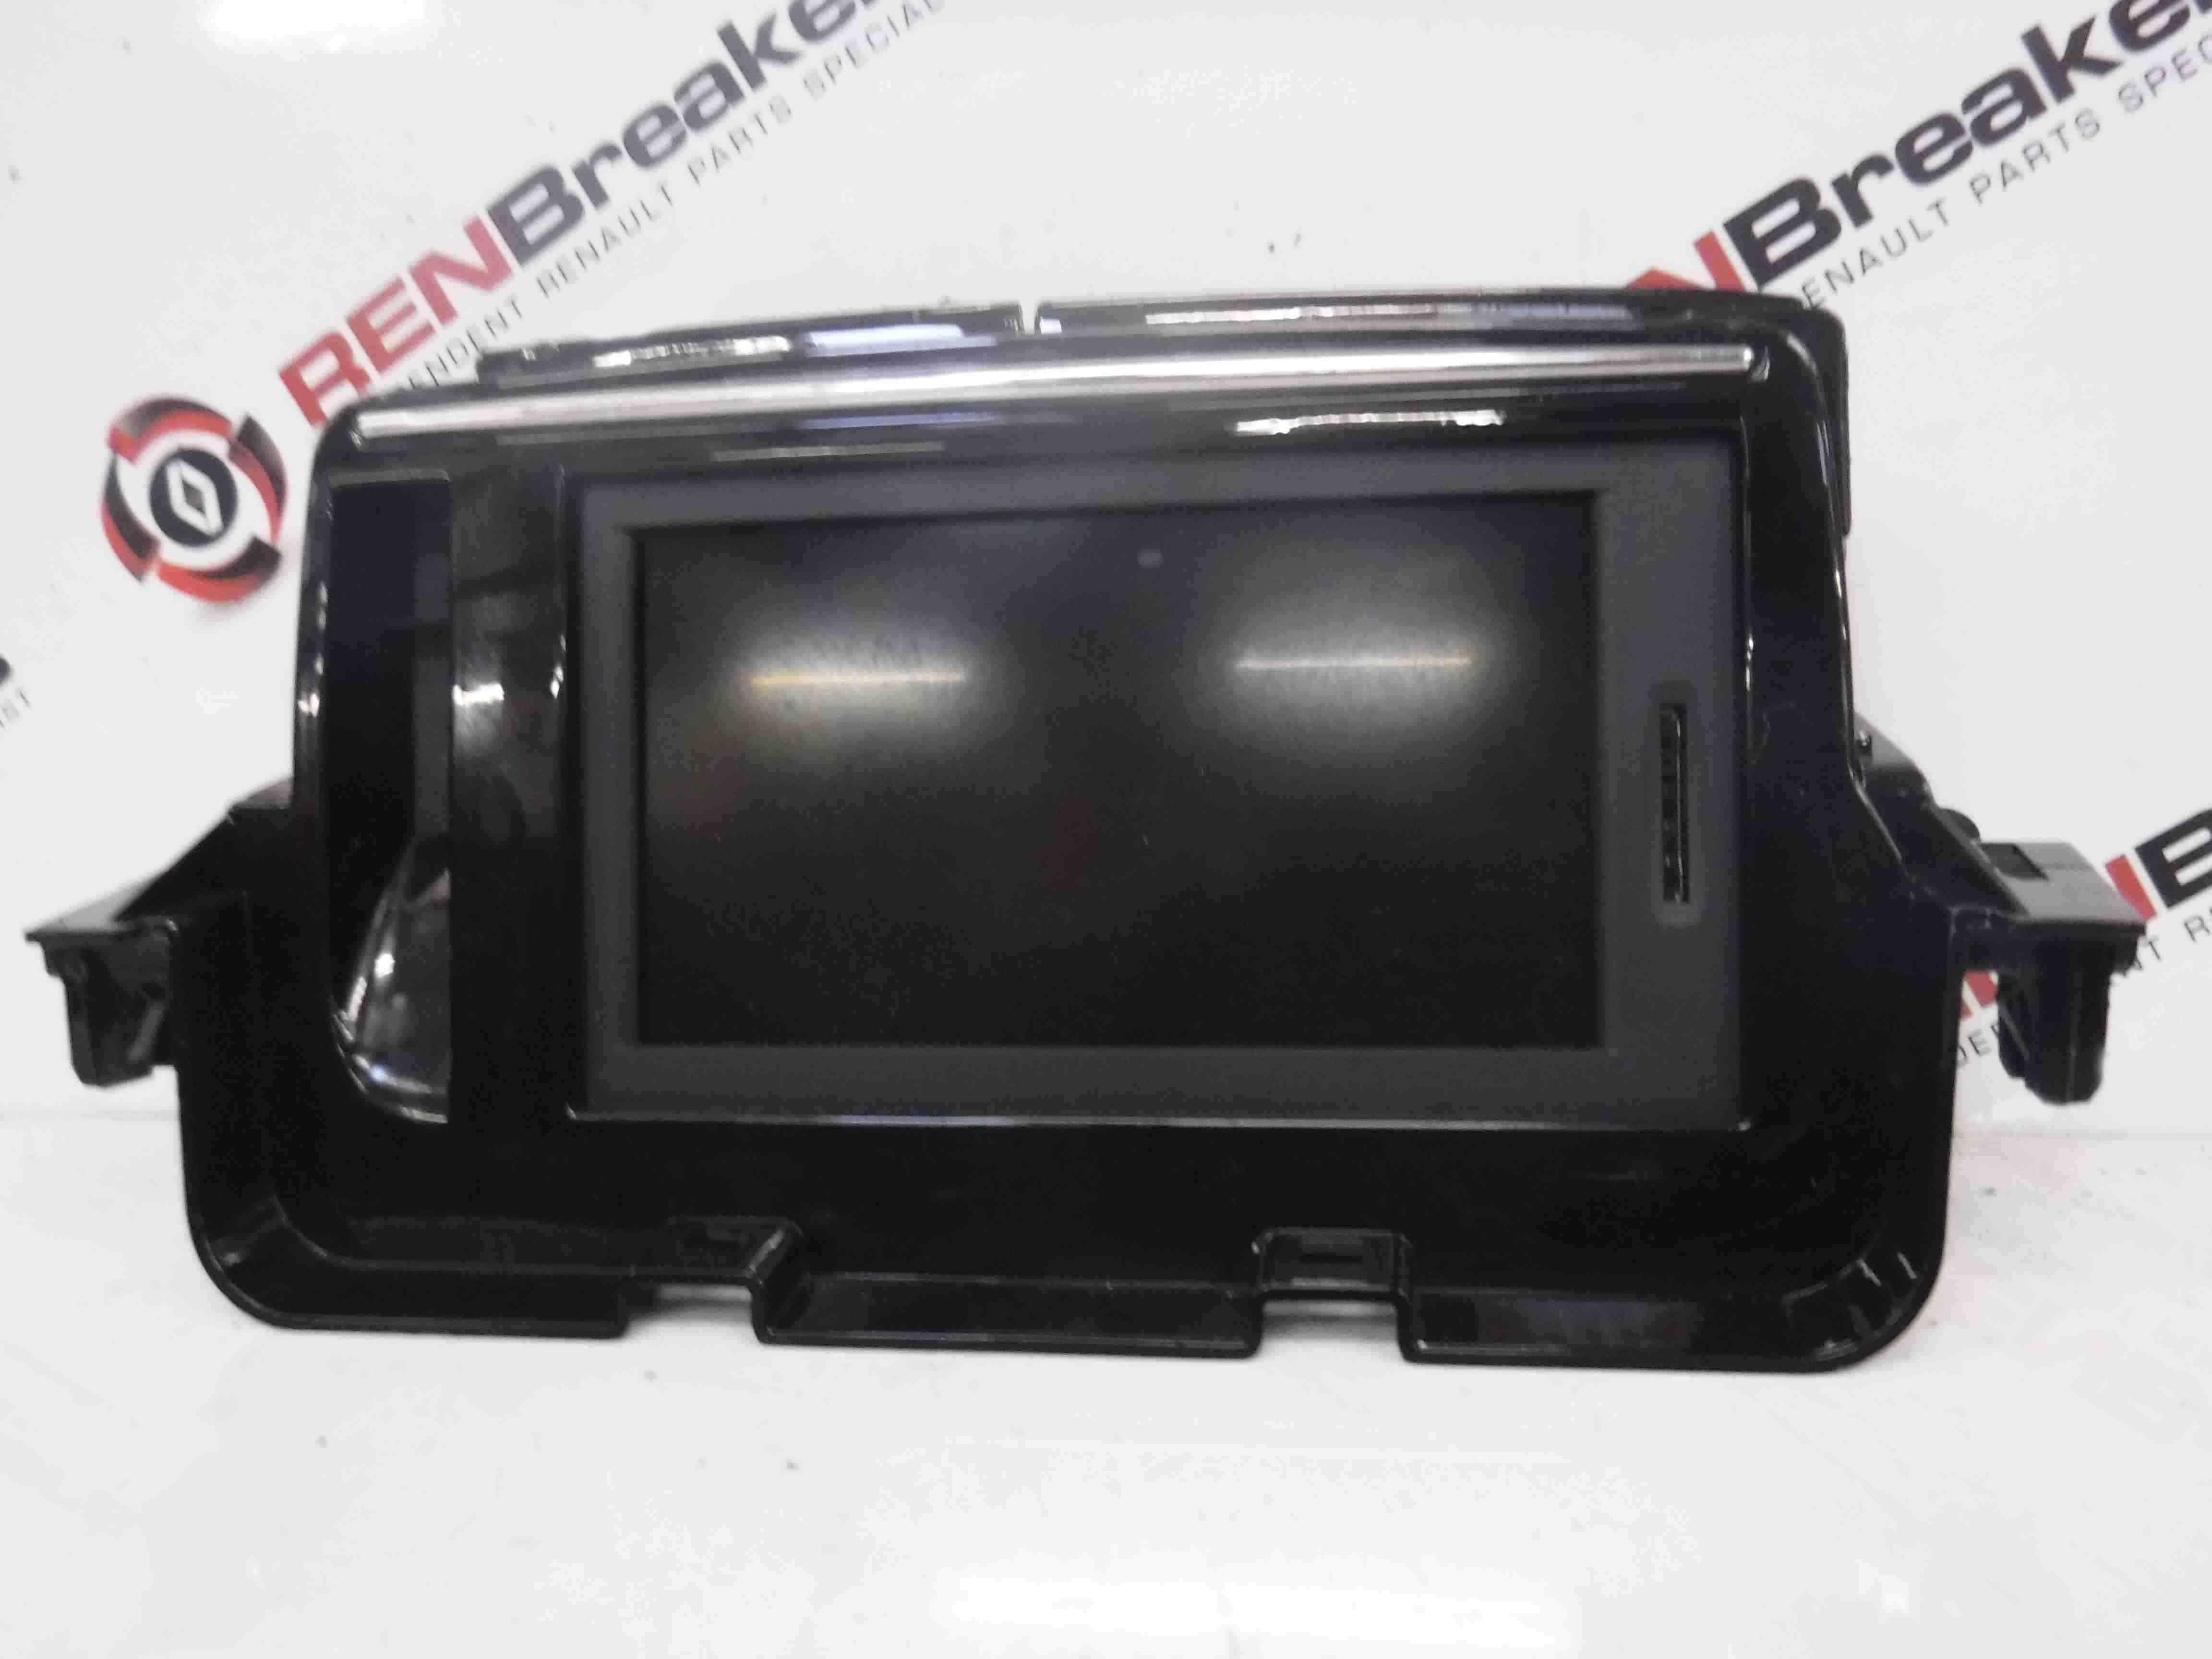 Renault Megane MK3 2008-2014 Sat Nav Screen Display LCD 259150931R